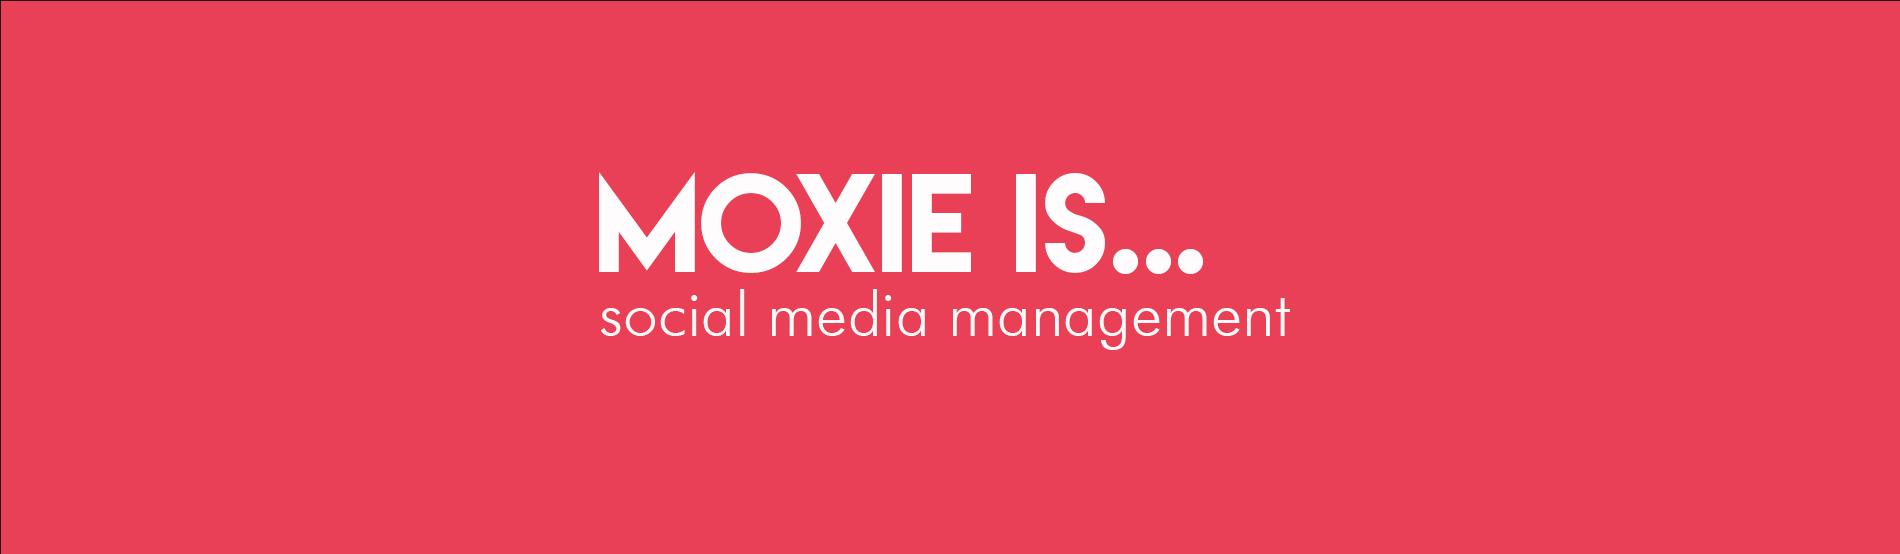 moxie creative solutions social media management banner